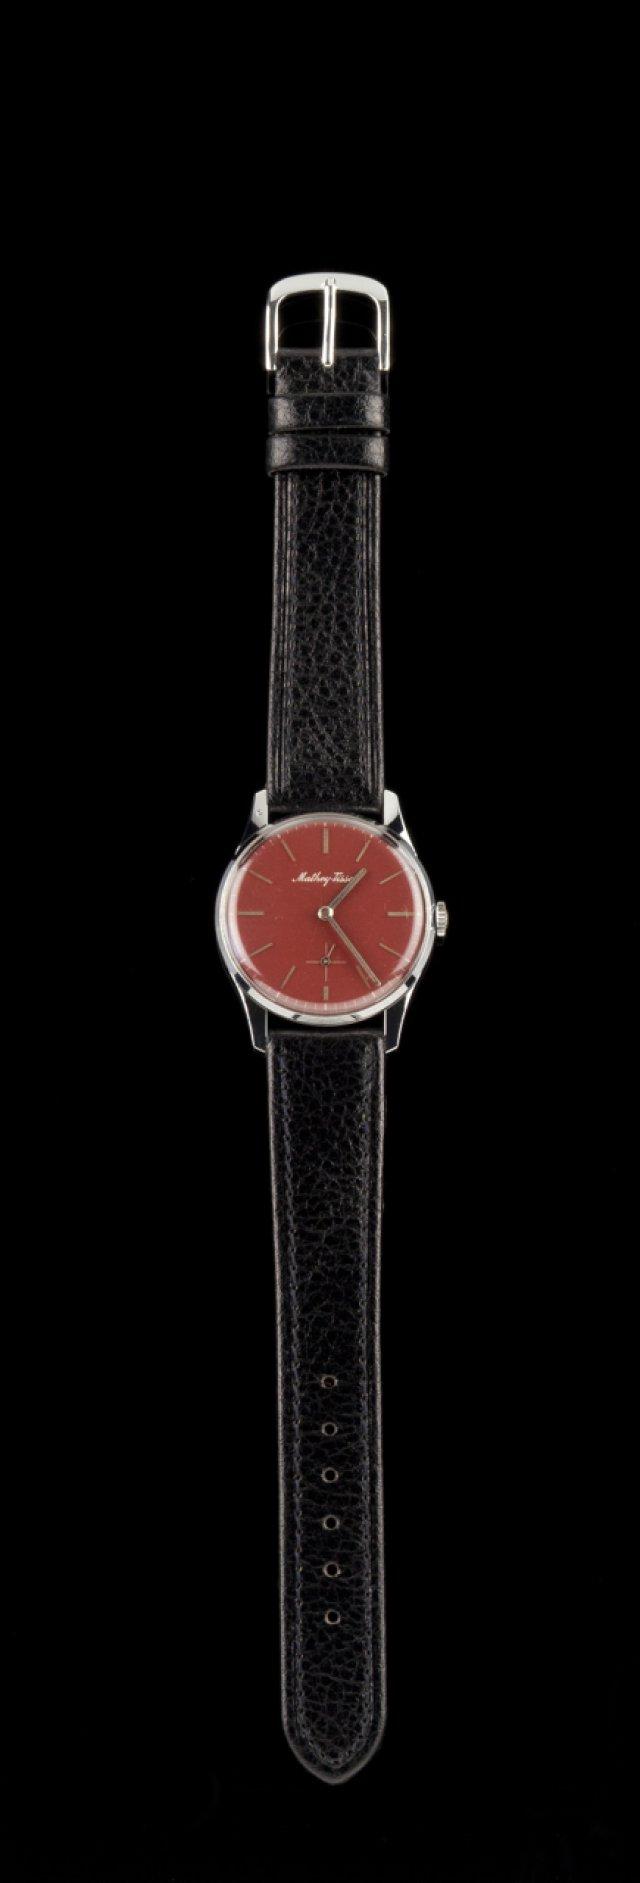 Relógio de pulso MATHEY-TISSOT